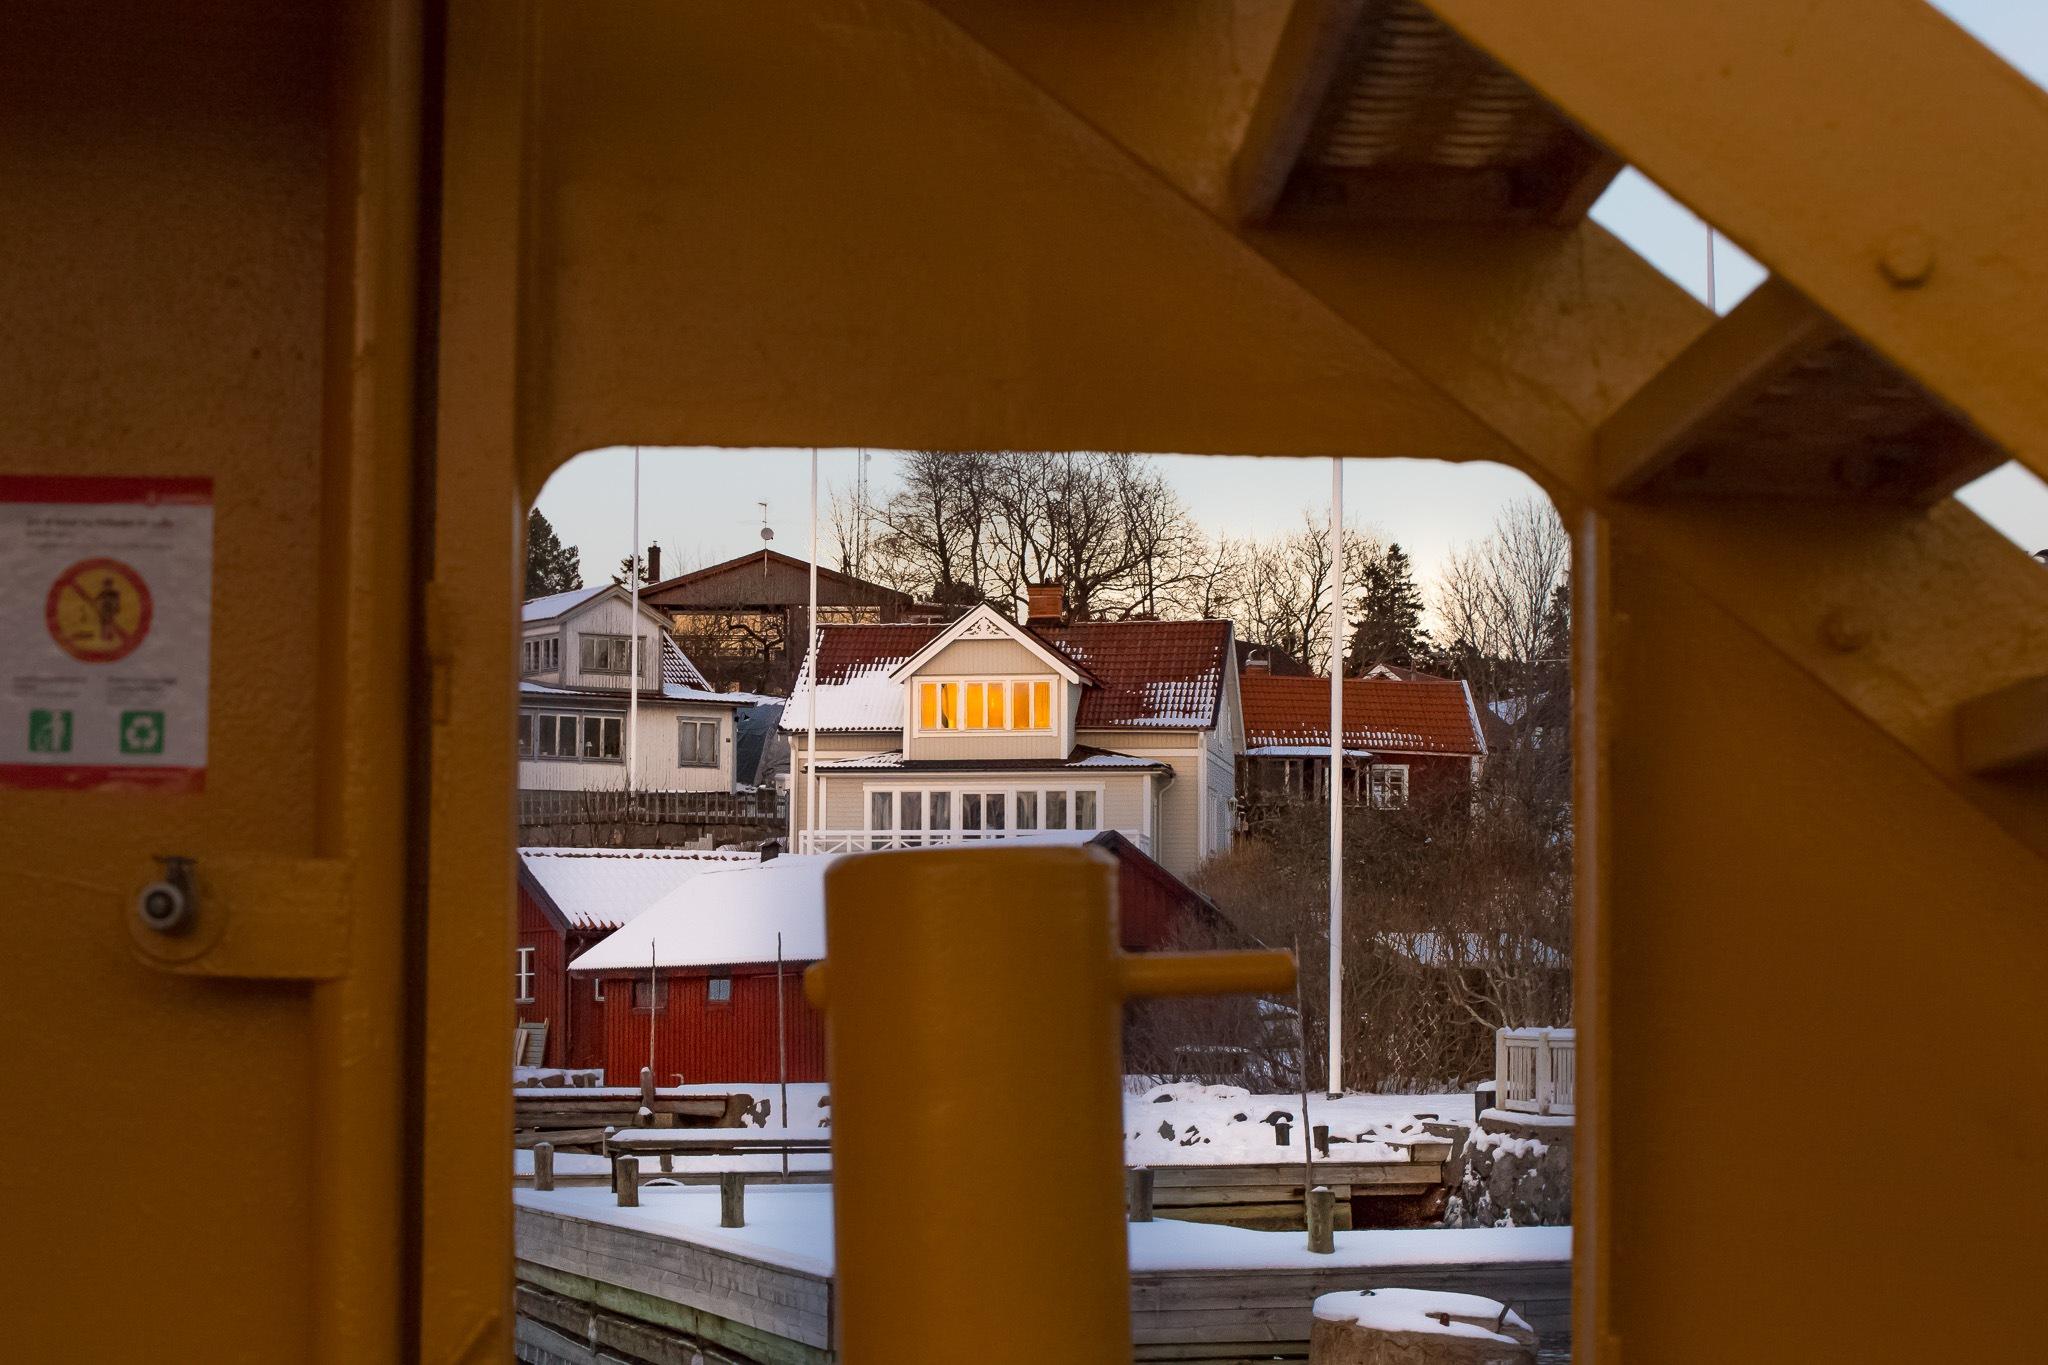 The descending sun only reaches the upper floor by Jonas Hermansson